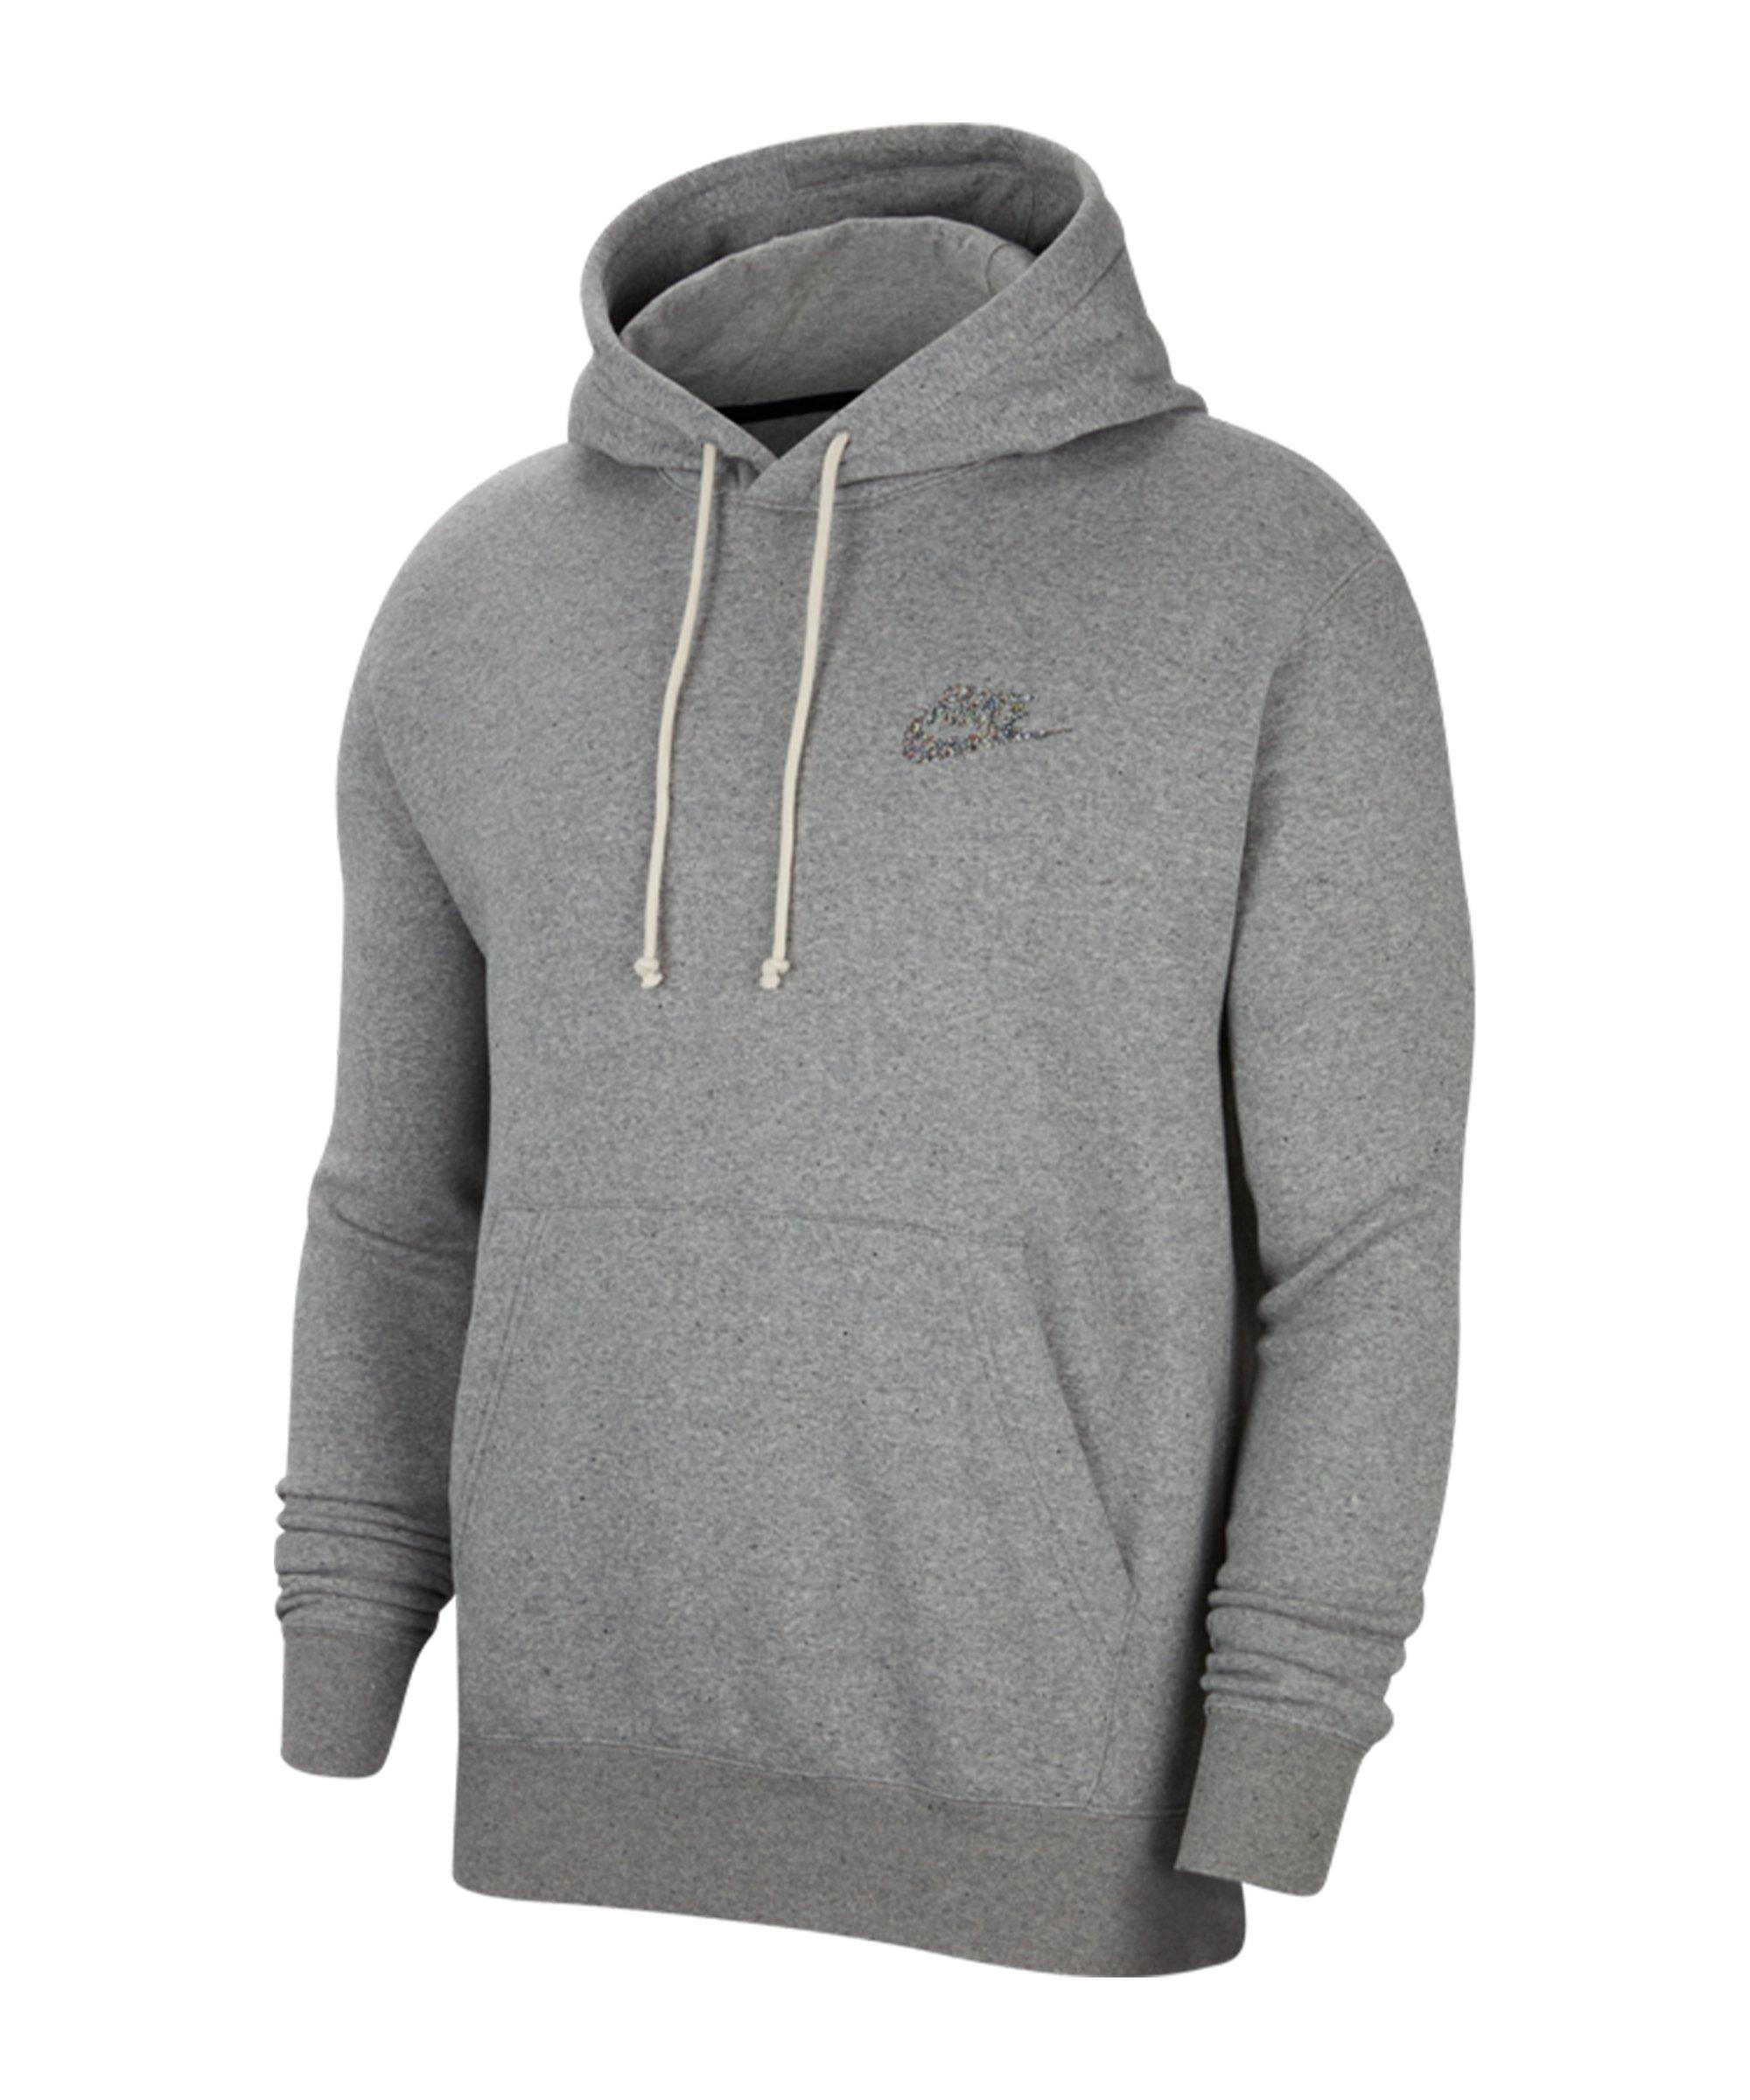 Nike Grind Hoody Grau F902 - grau